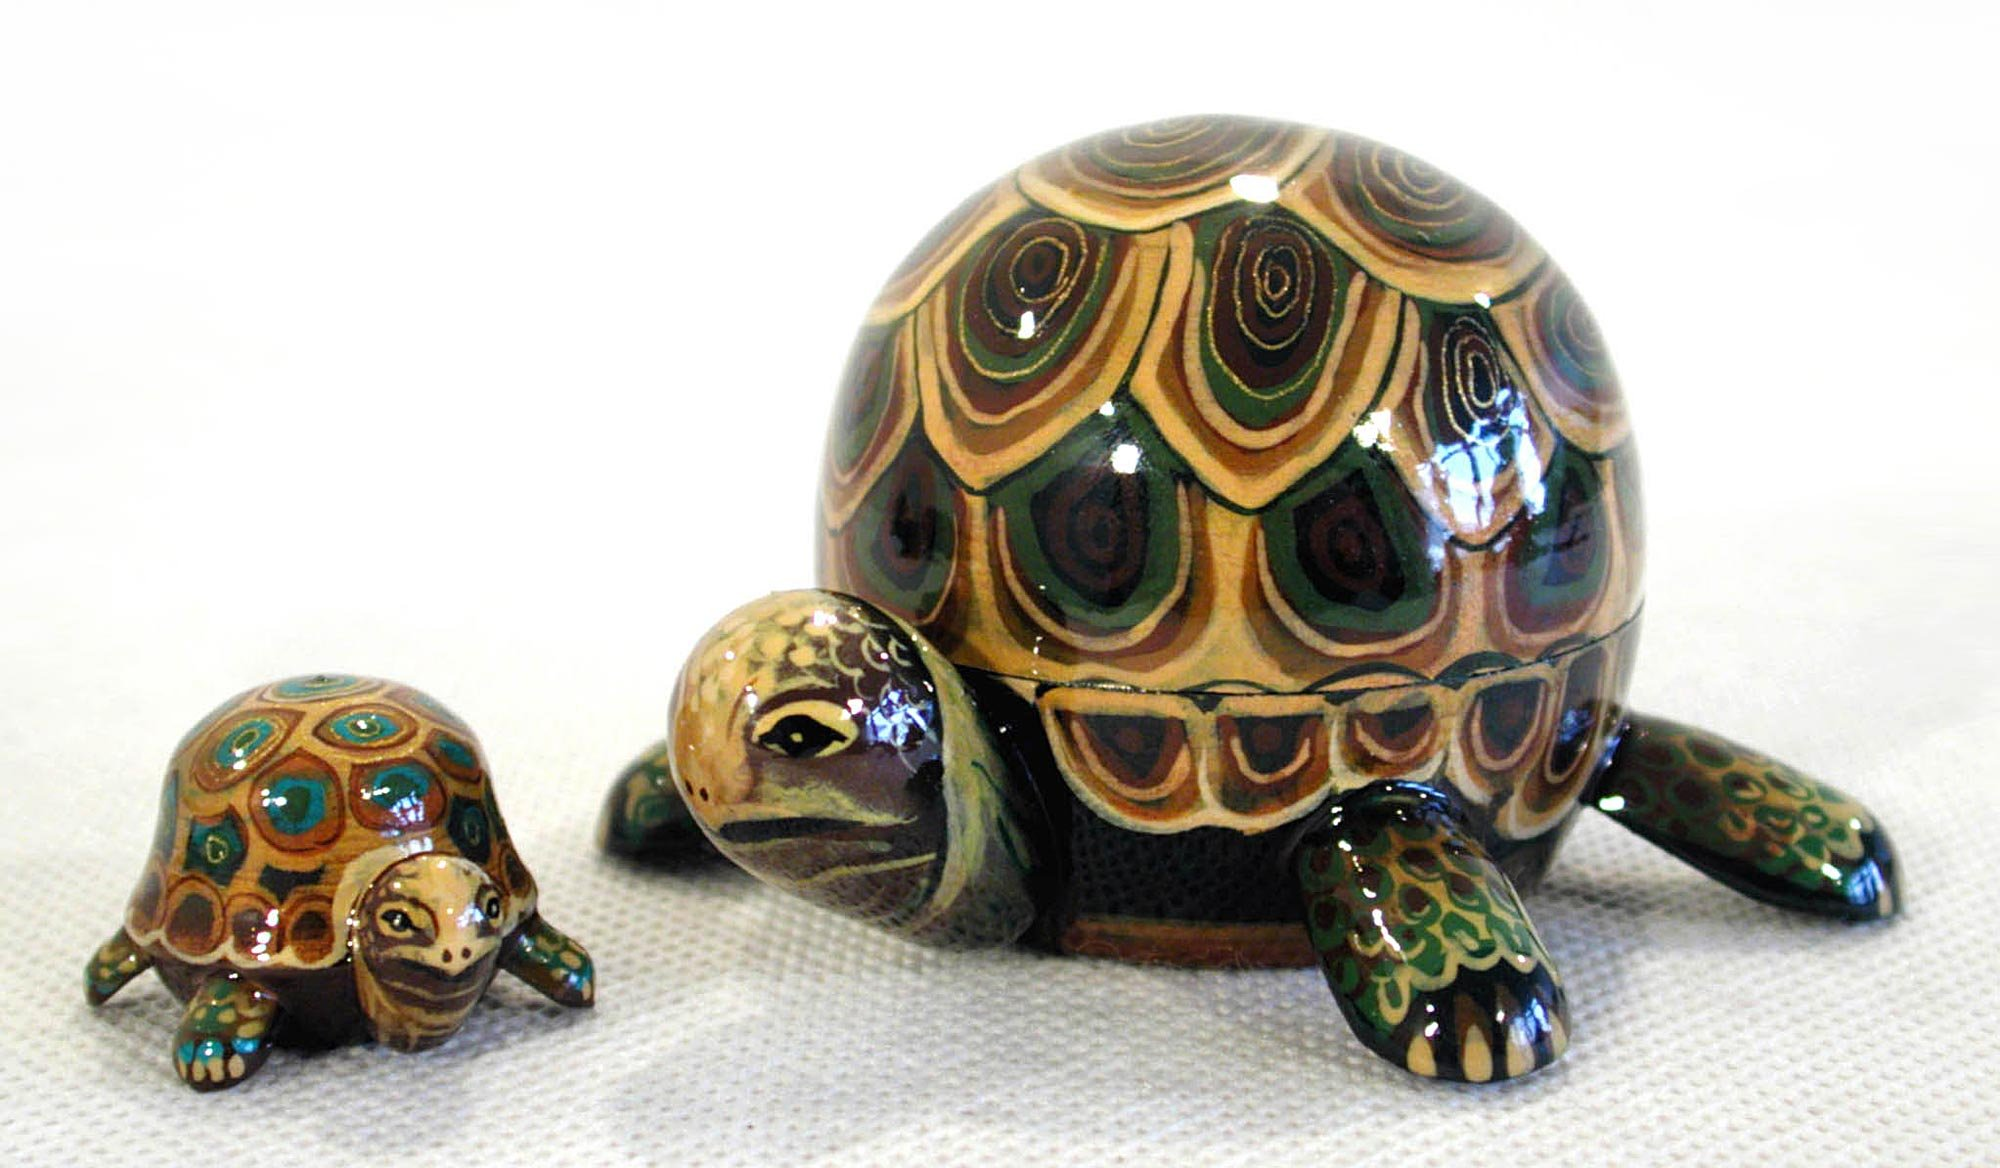 Turtle Nesting Doll 2pc./3''